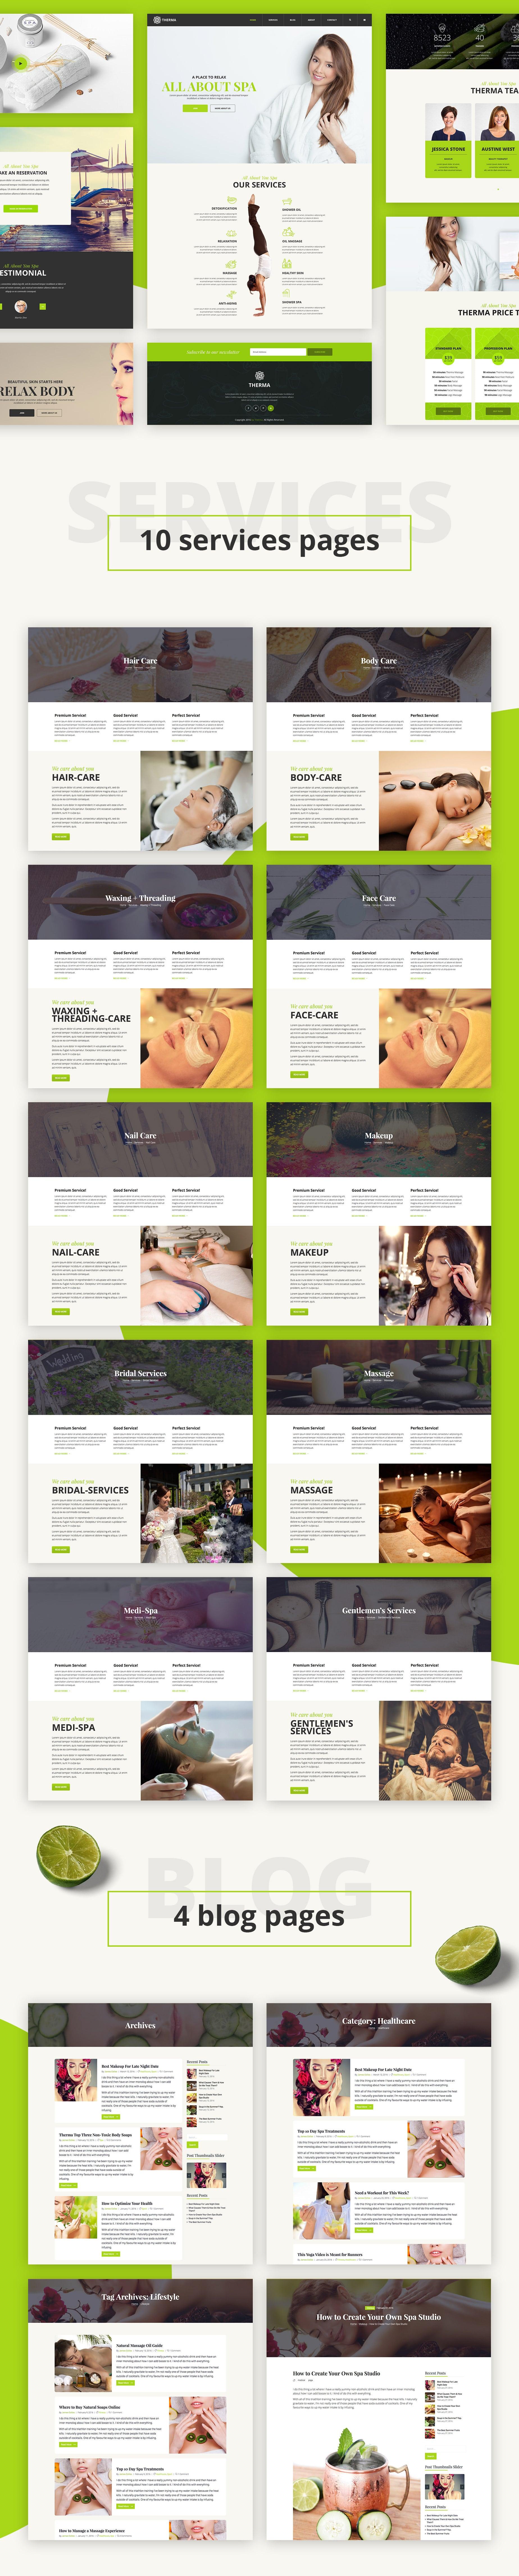 Therma - Spa, Beauty, Cosmetic WordPress Theme - 3